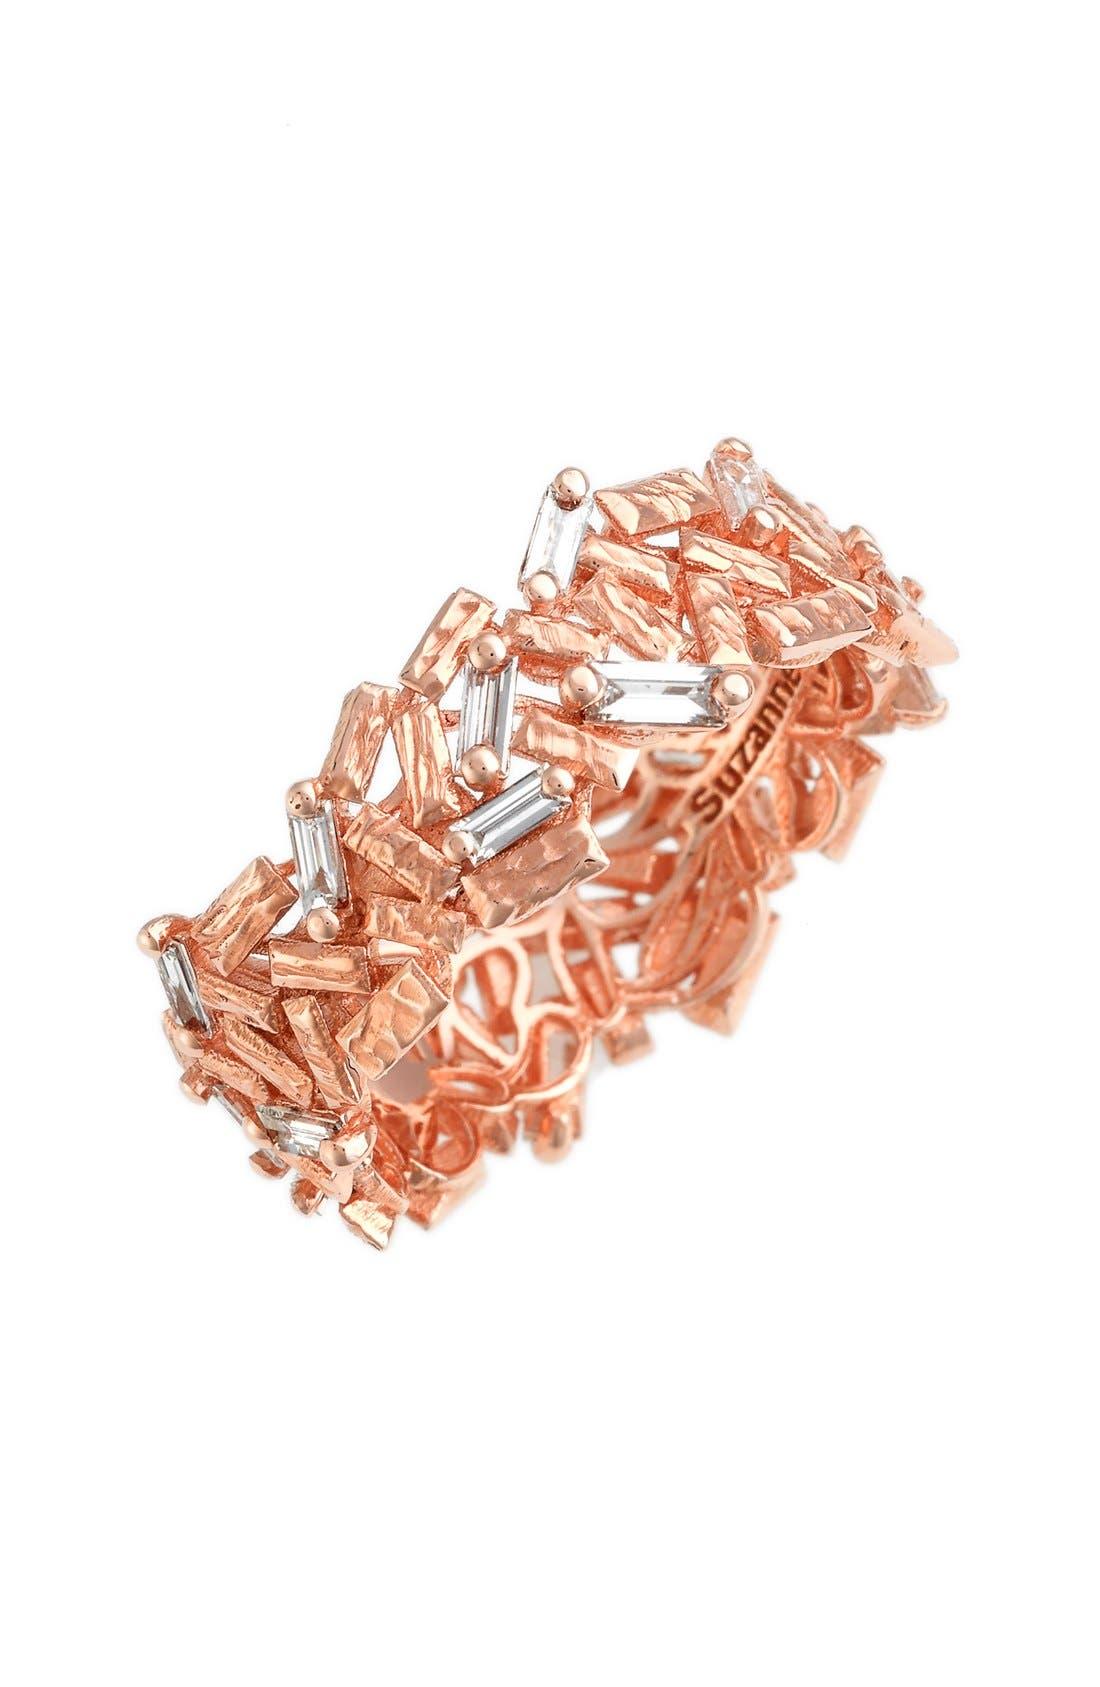 Alternate Image 1 Selected - Suzanne Kalan 'Firework' Baguette Diamond Eternity Ring